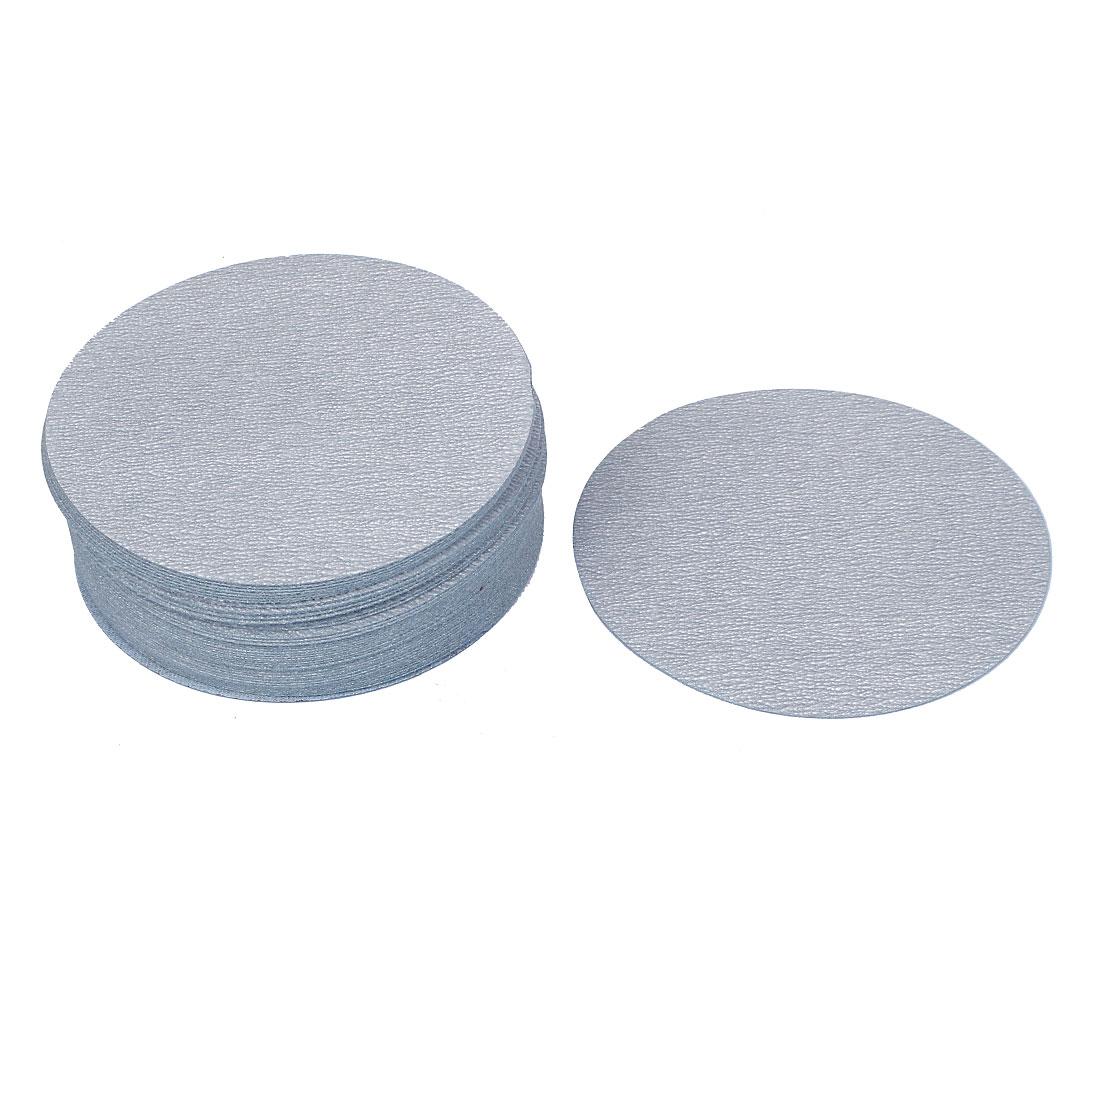 "5"" Dia Polishing Round Dry Abrasive Sanding Sandpaper Sheet Disc 600 Grit 50pcs"